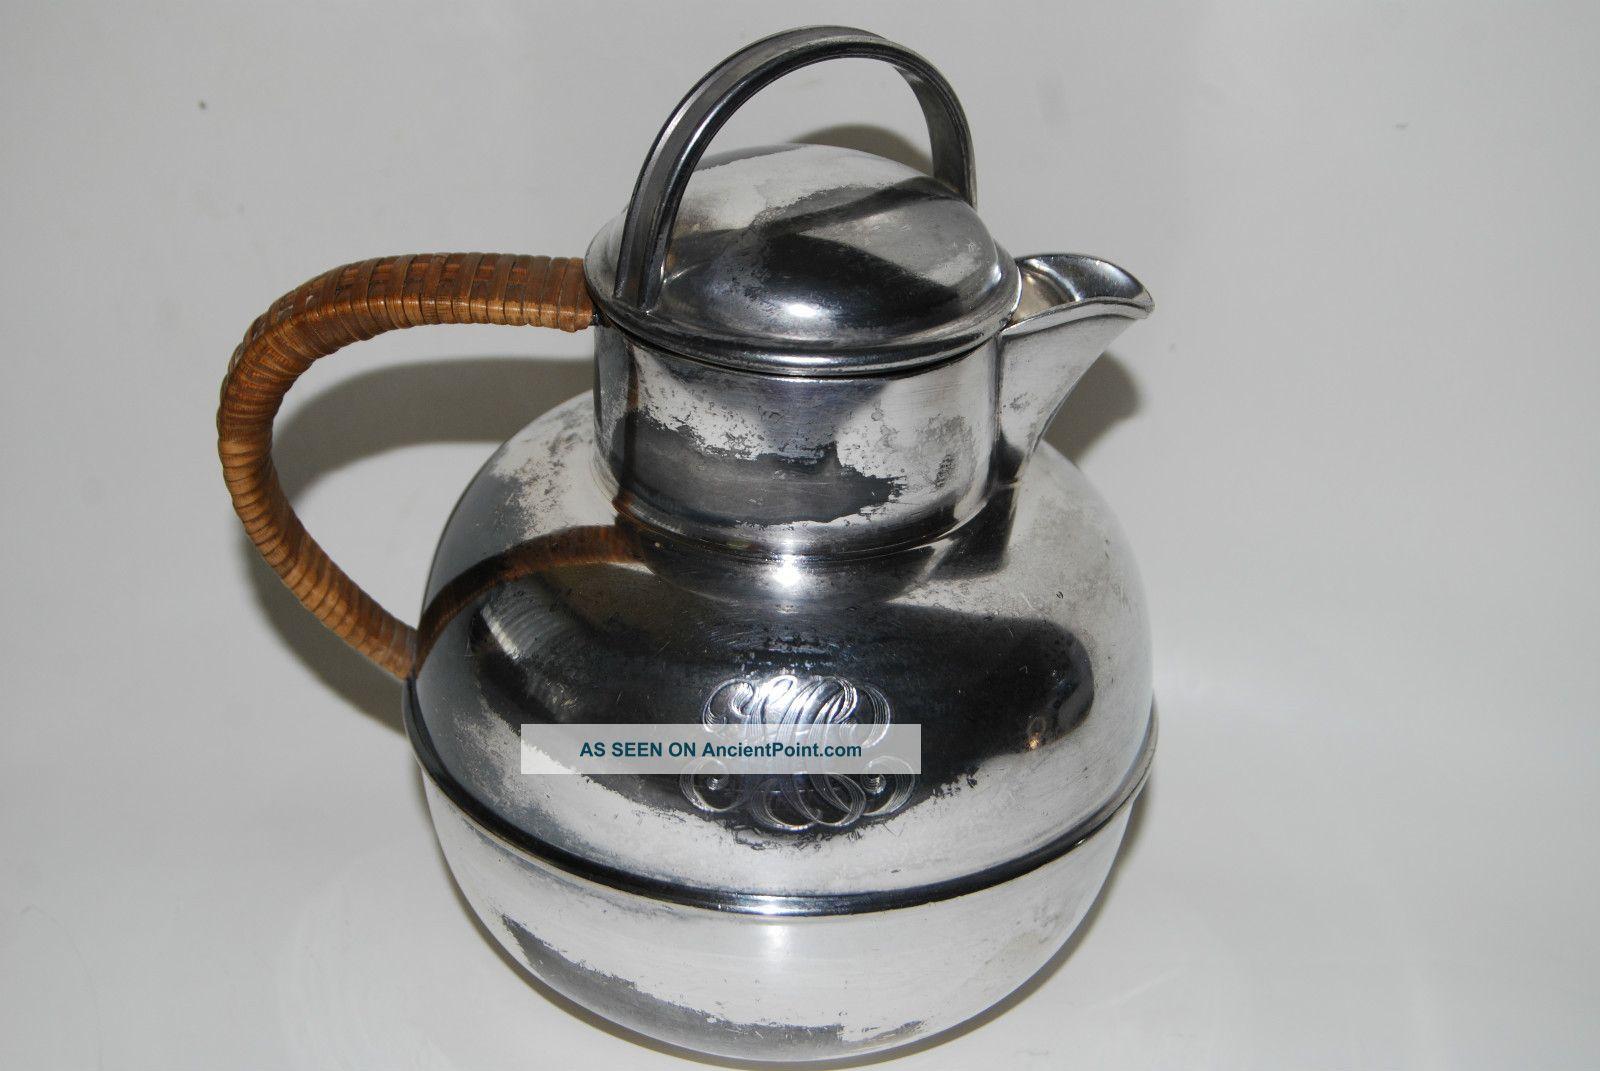 Vintage Wilcox Silver Plated Tea Kettle - Pot Monogram Initials Tea/Coffee Pots & Sets photo